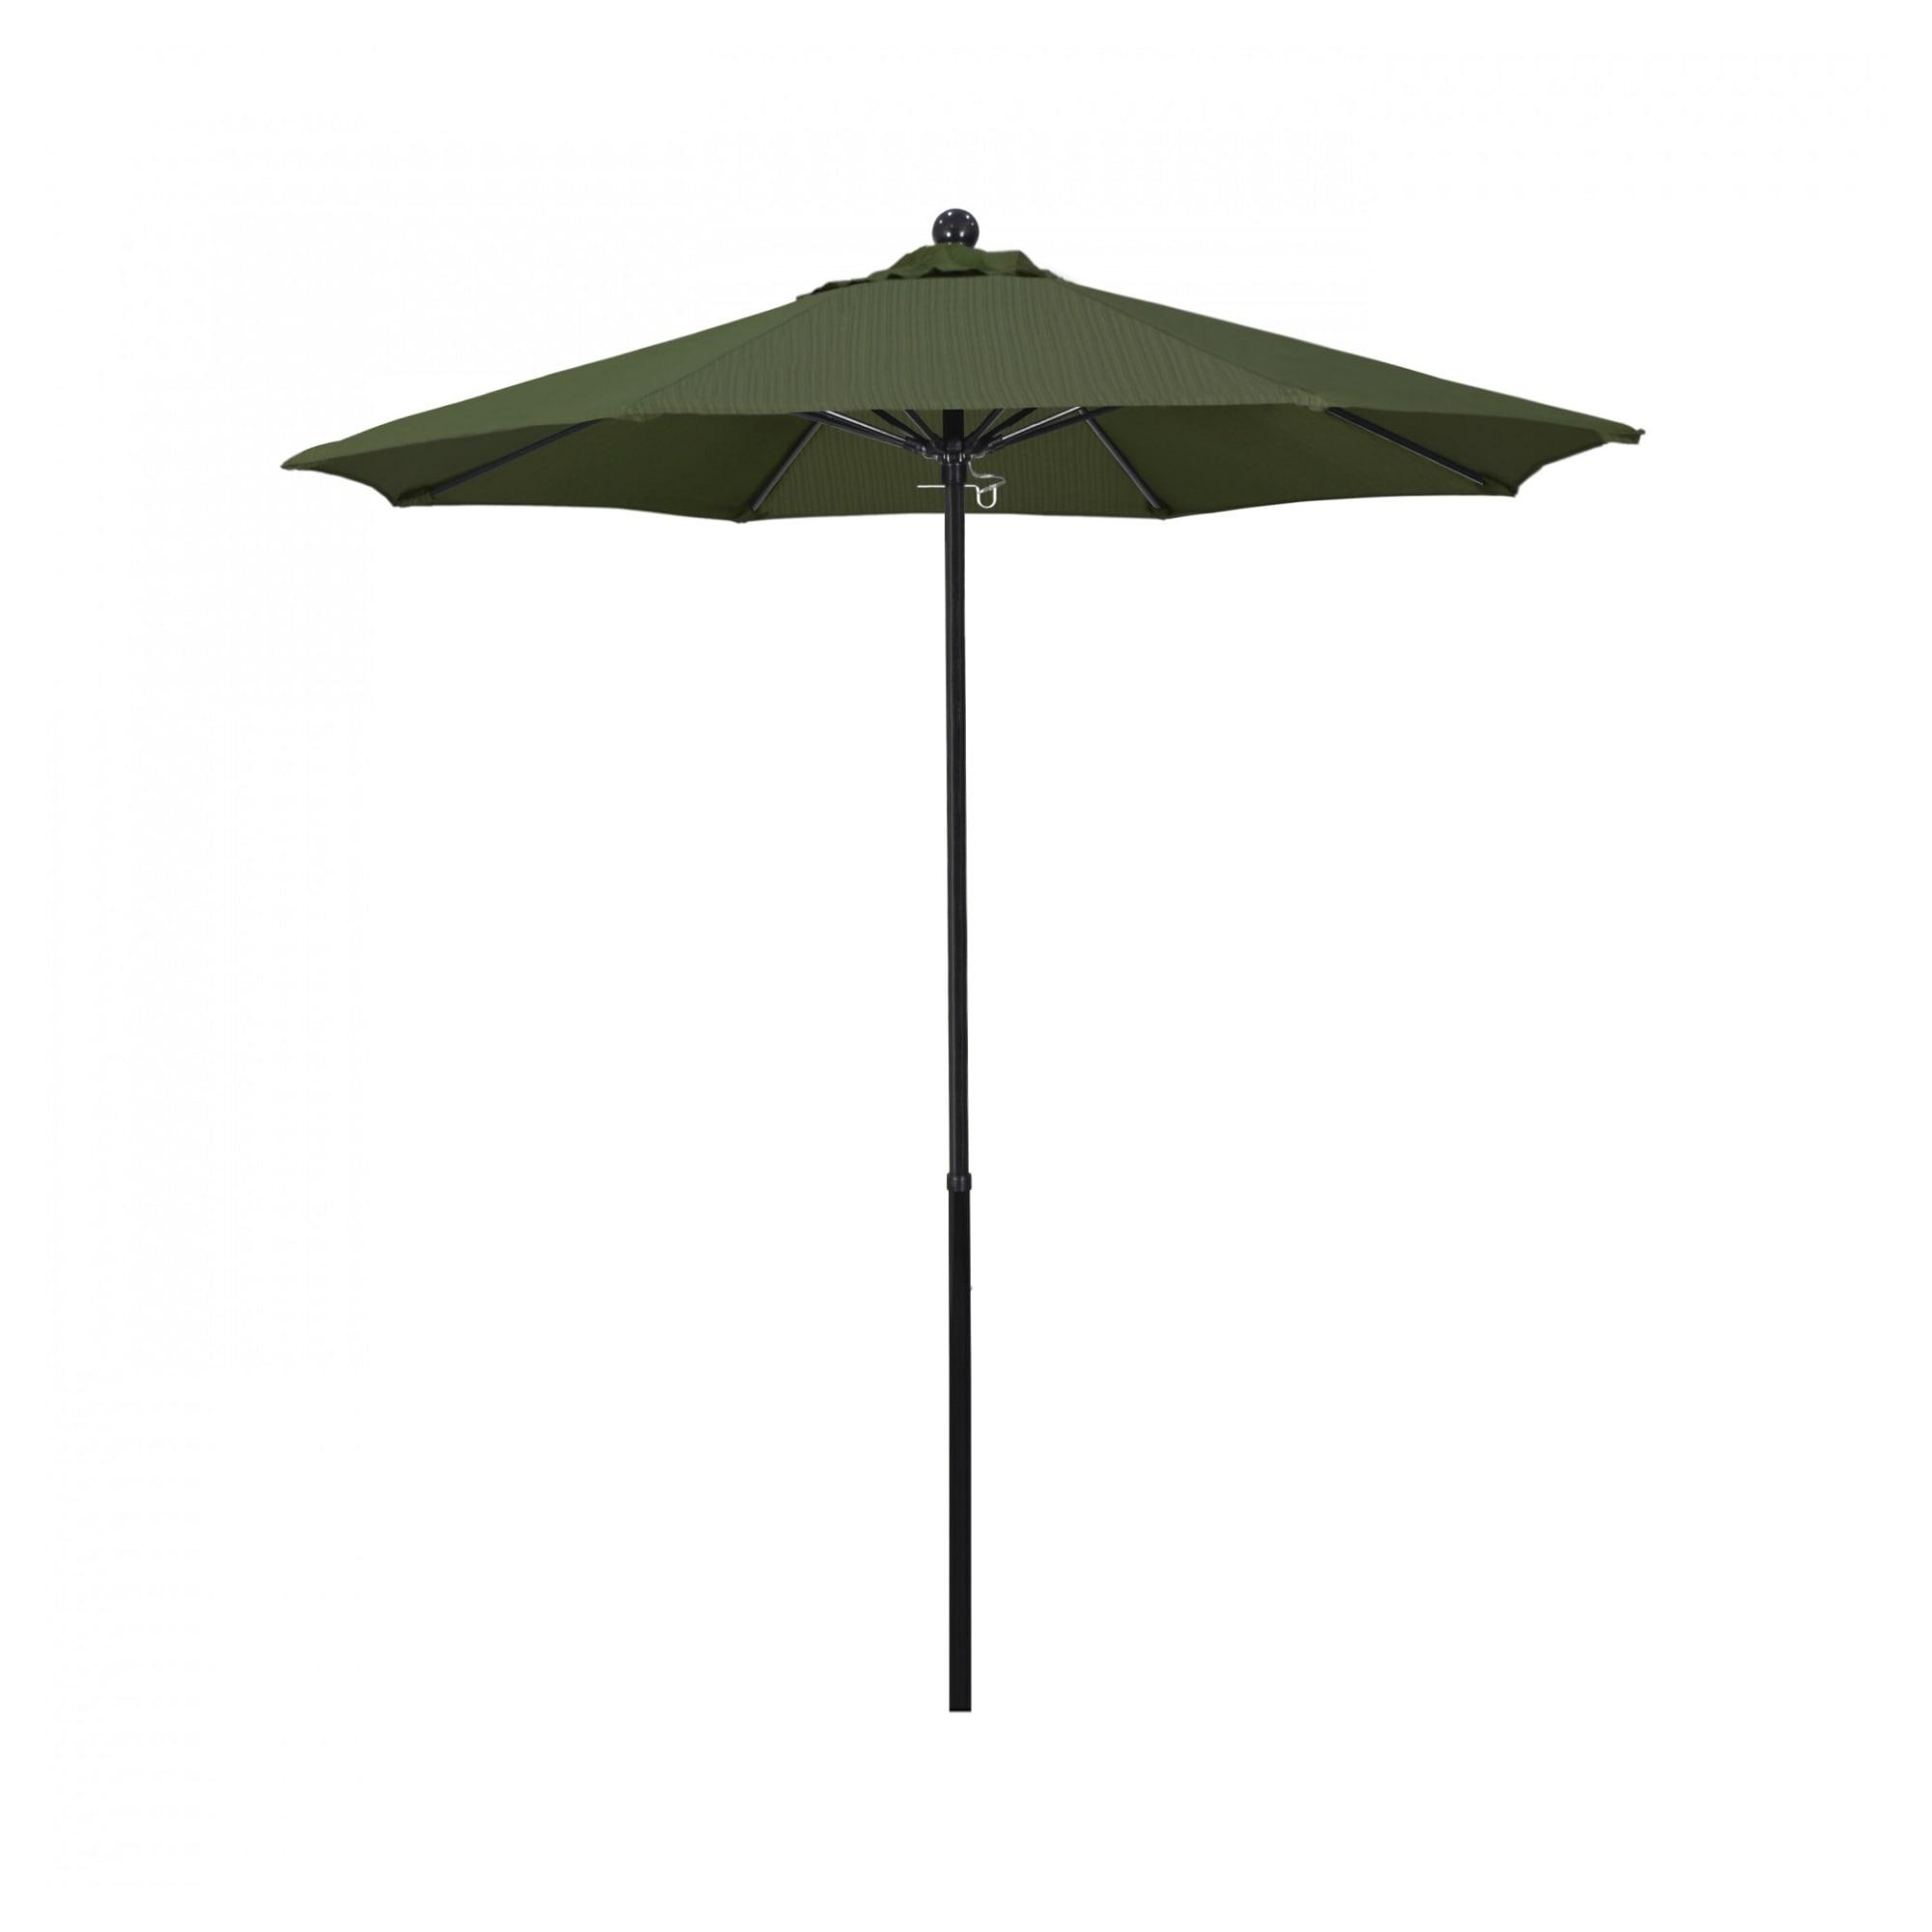 9 ft Frisco Fiberglass Commercial Umbrella with 9 ft Frisco Fiberglass Commercial Umbrella